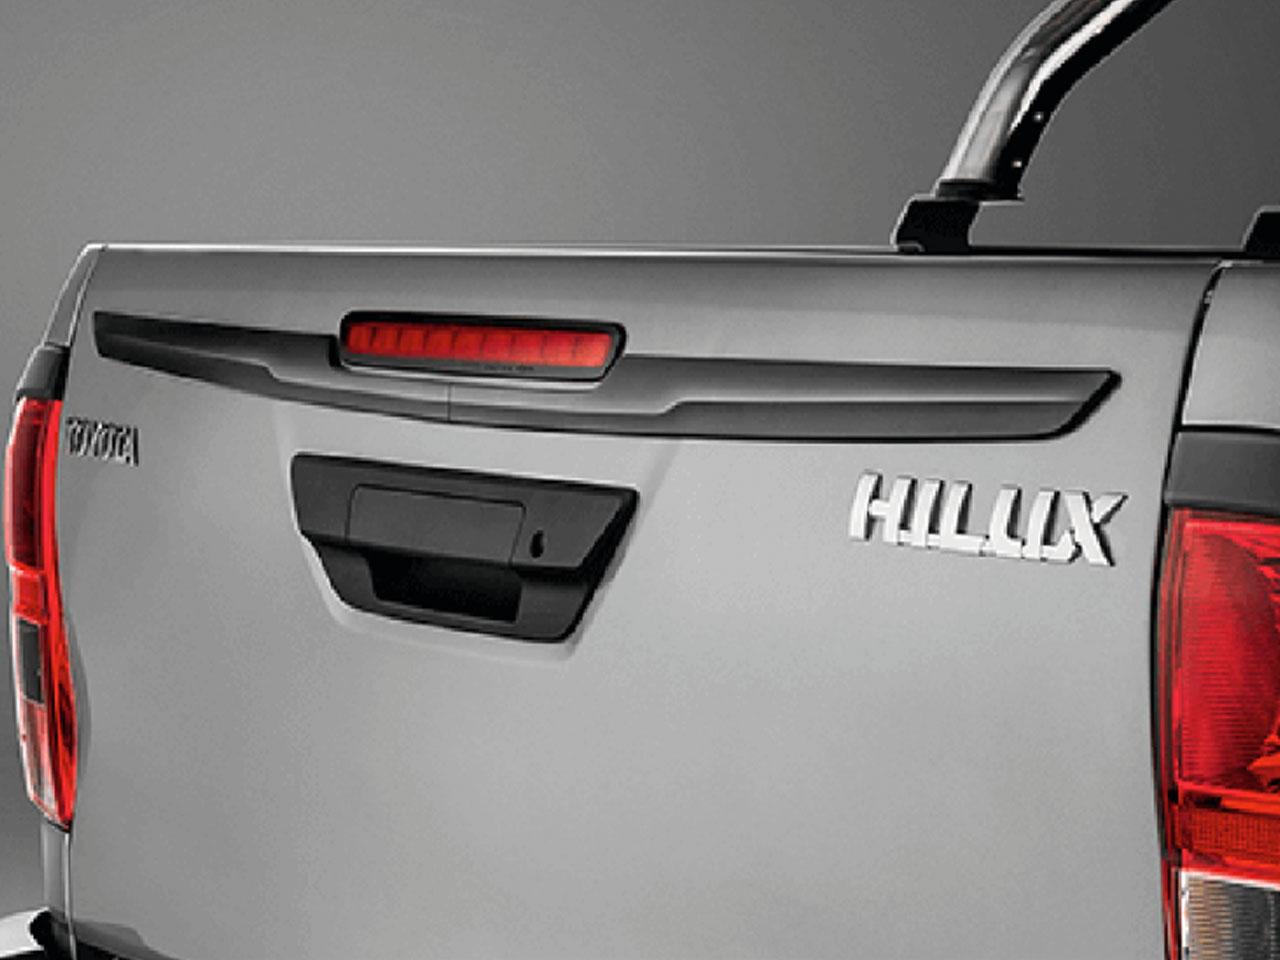 Aplique Preto Fosco da Tampa da Caçamba Hilux STD SR SRV SRX GR-S Cabine Simples  - Mirai Peças Toyota